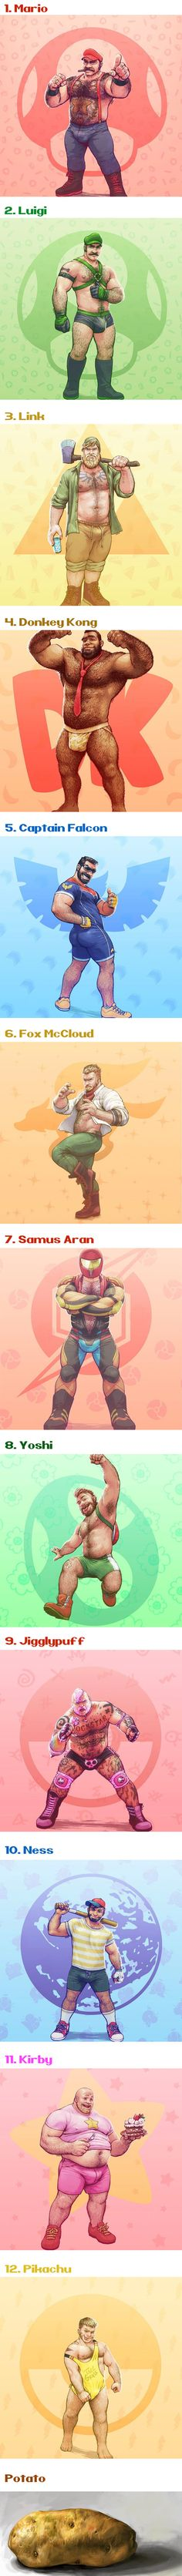 Artist Transformed Super Smash Bros. Characters Into Huge Bears